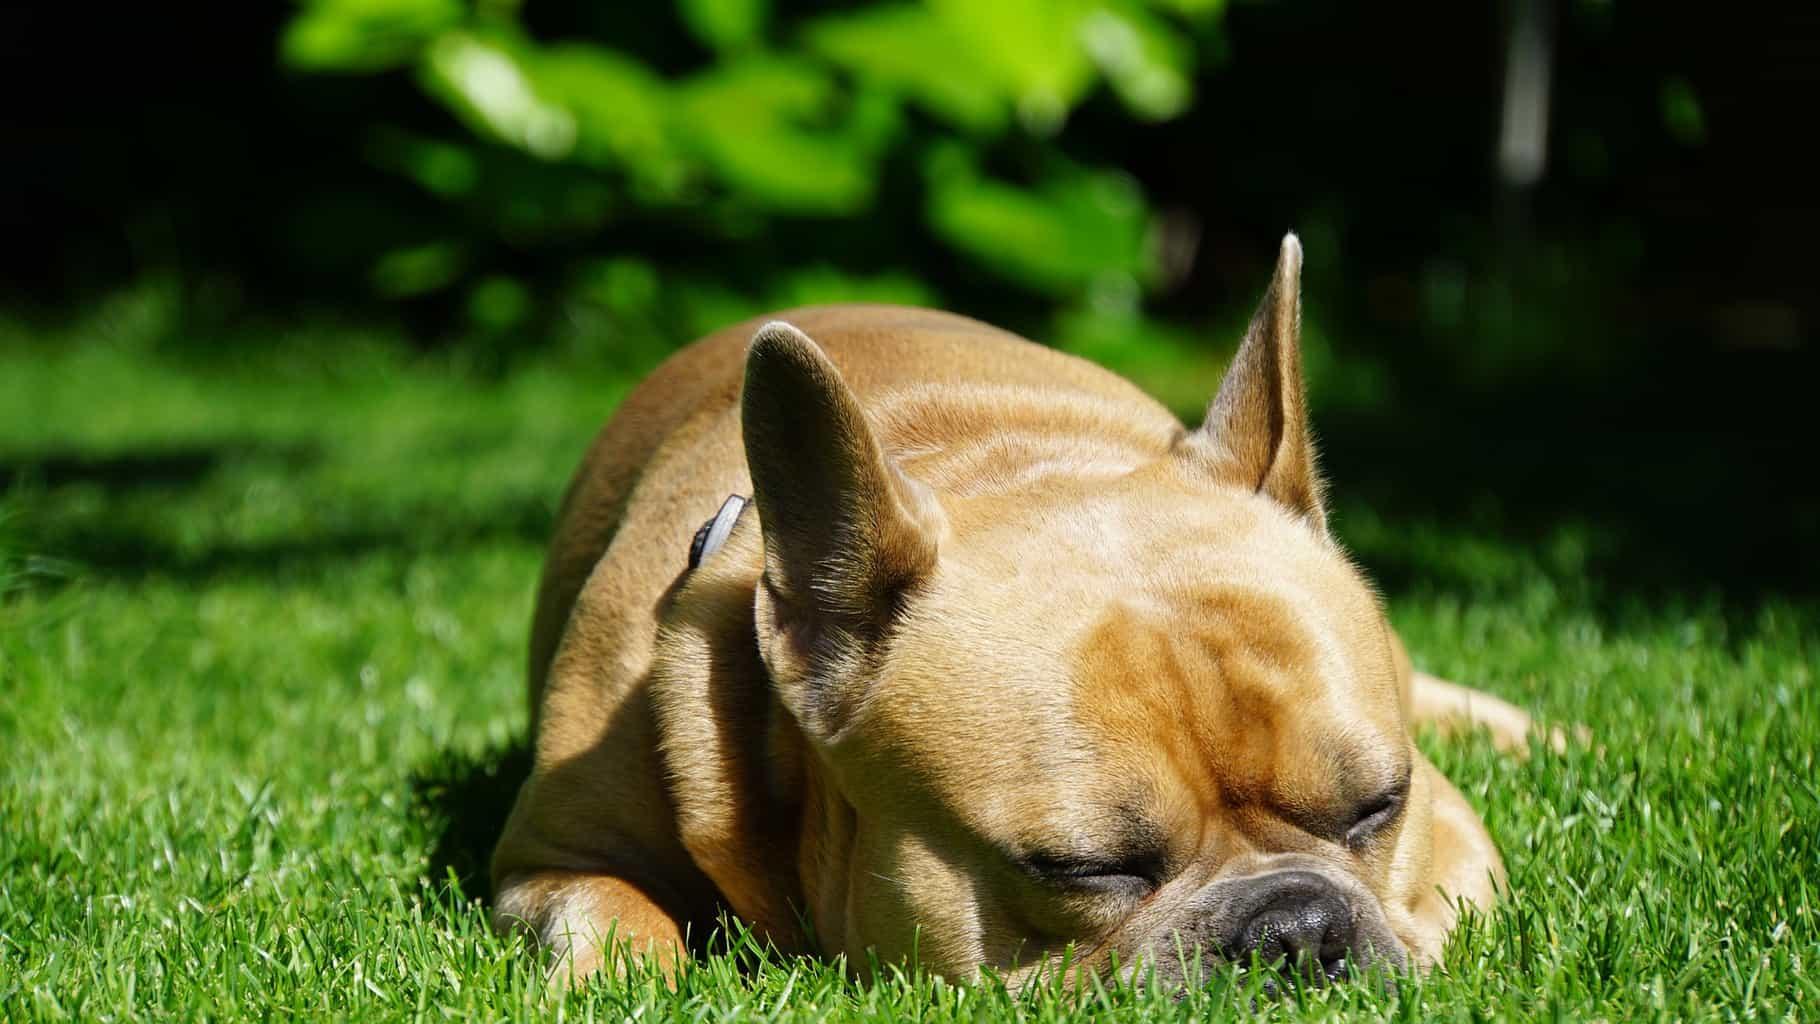 French Bulldog lying in grass